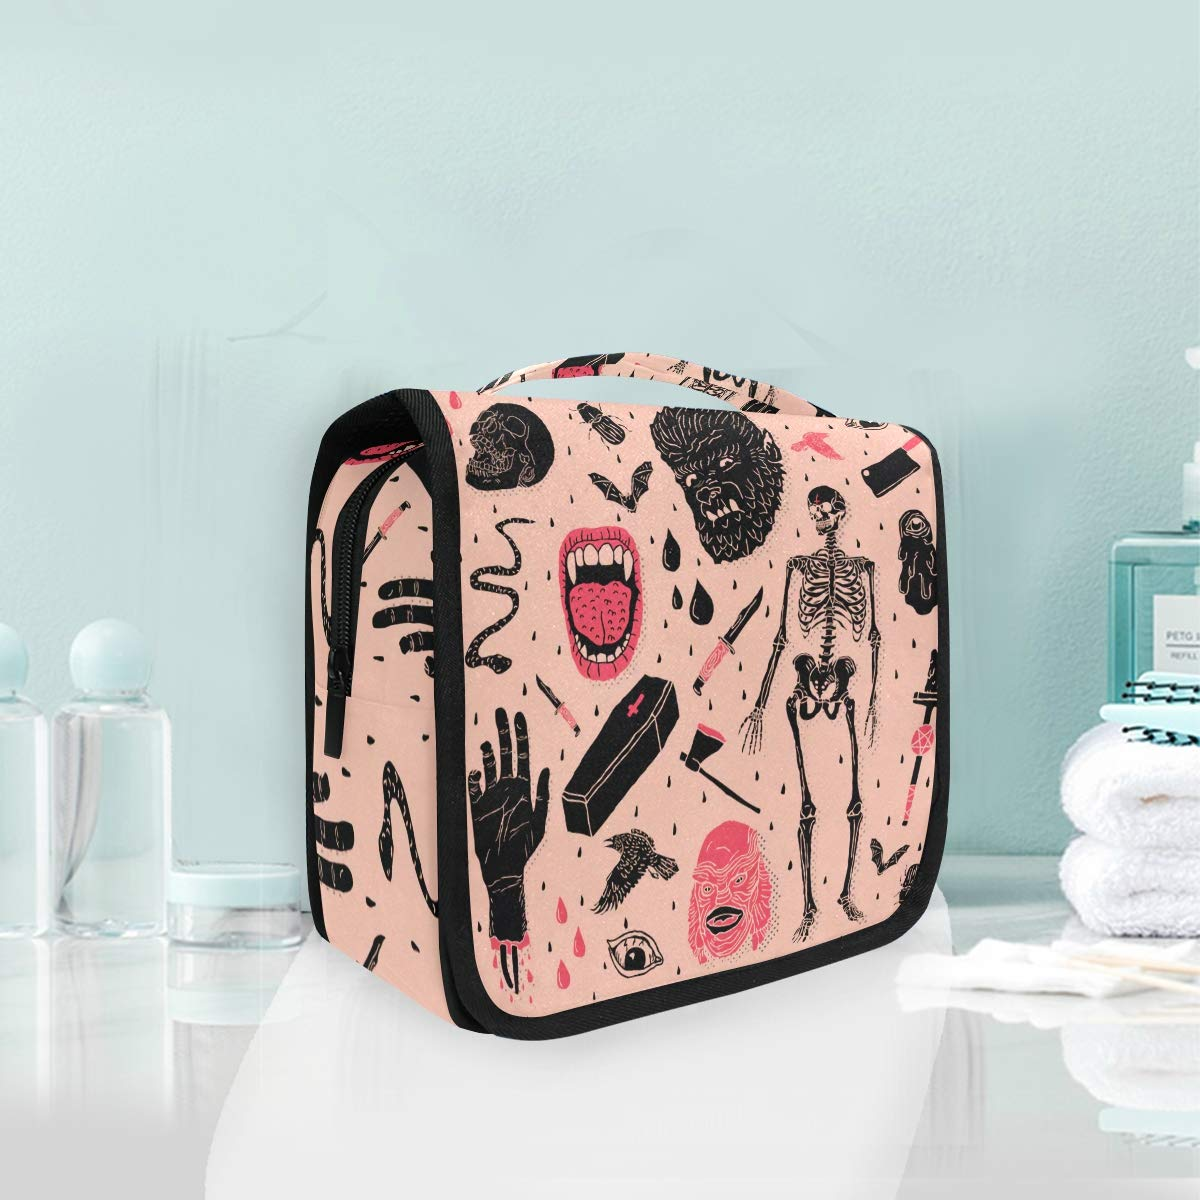 Cosmetic Makeup Toiletry Bag Travel Halloween Horror Skull Hanging